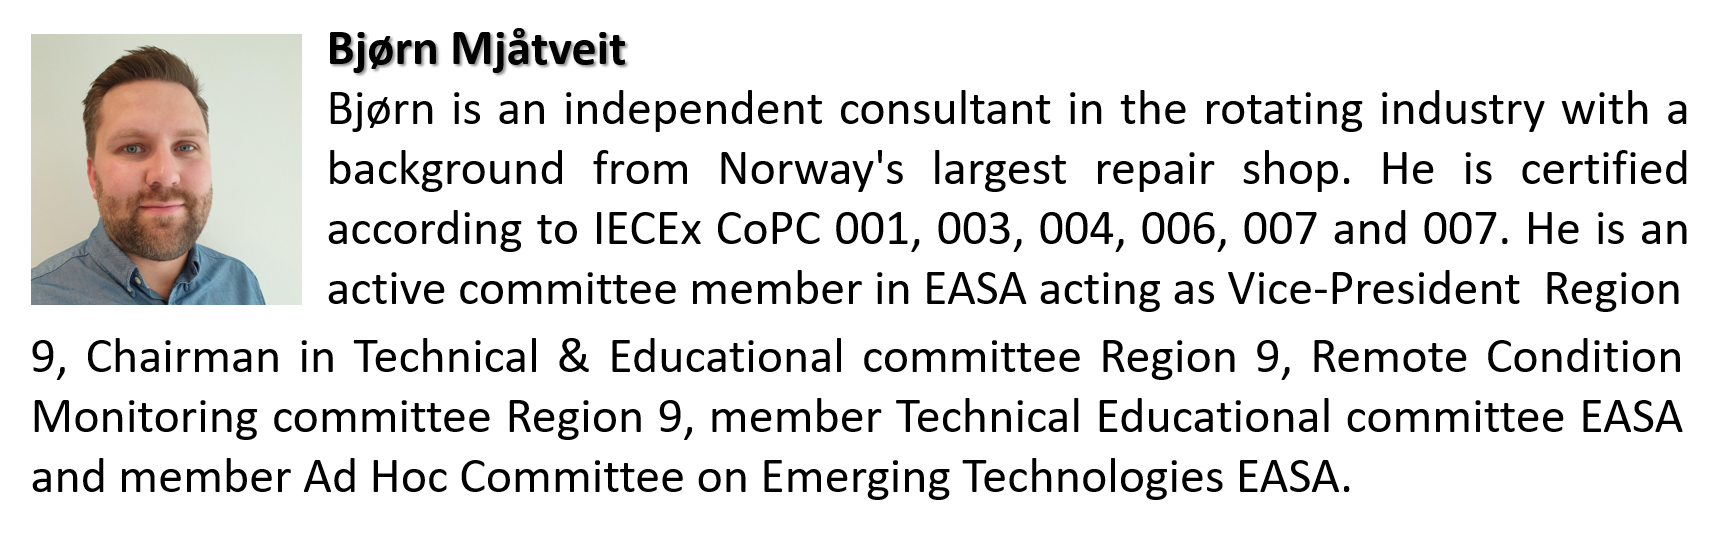 bjorn-cv